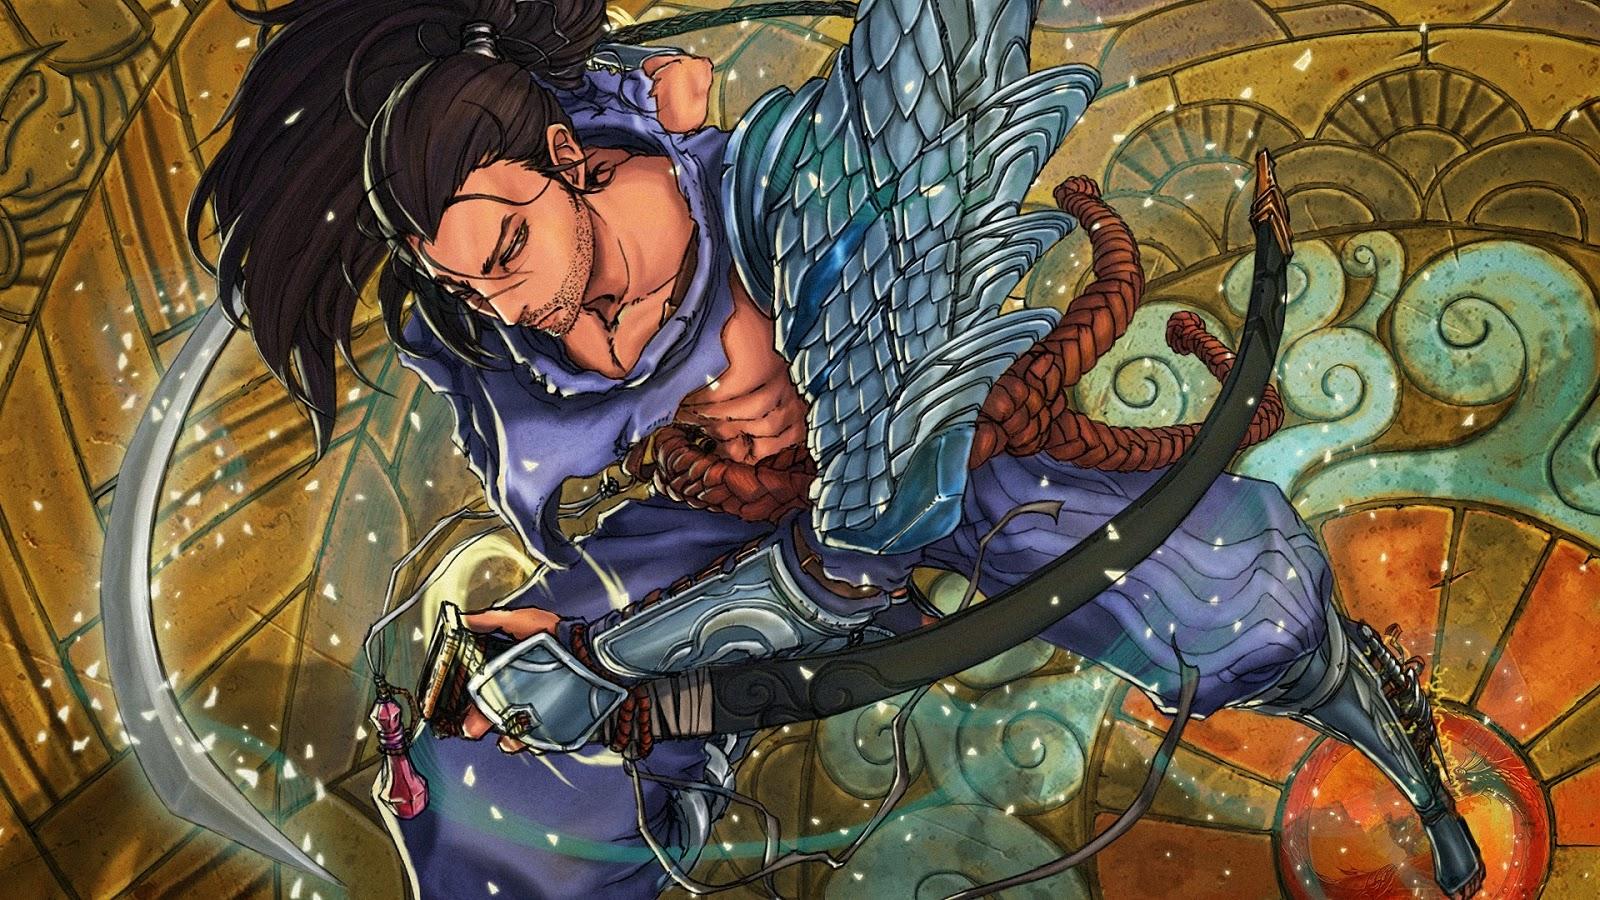 League Of Legends Yasuo Wallpaper: Yasuo League Of Legends Wallpaper, Yasuo Desktop Wallpaper